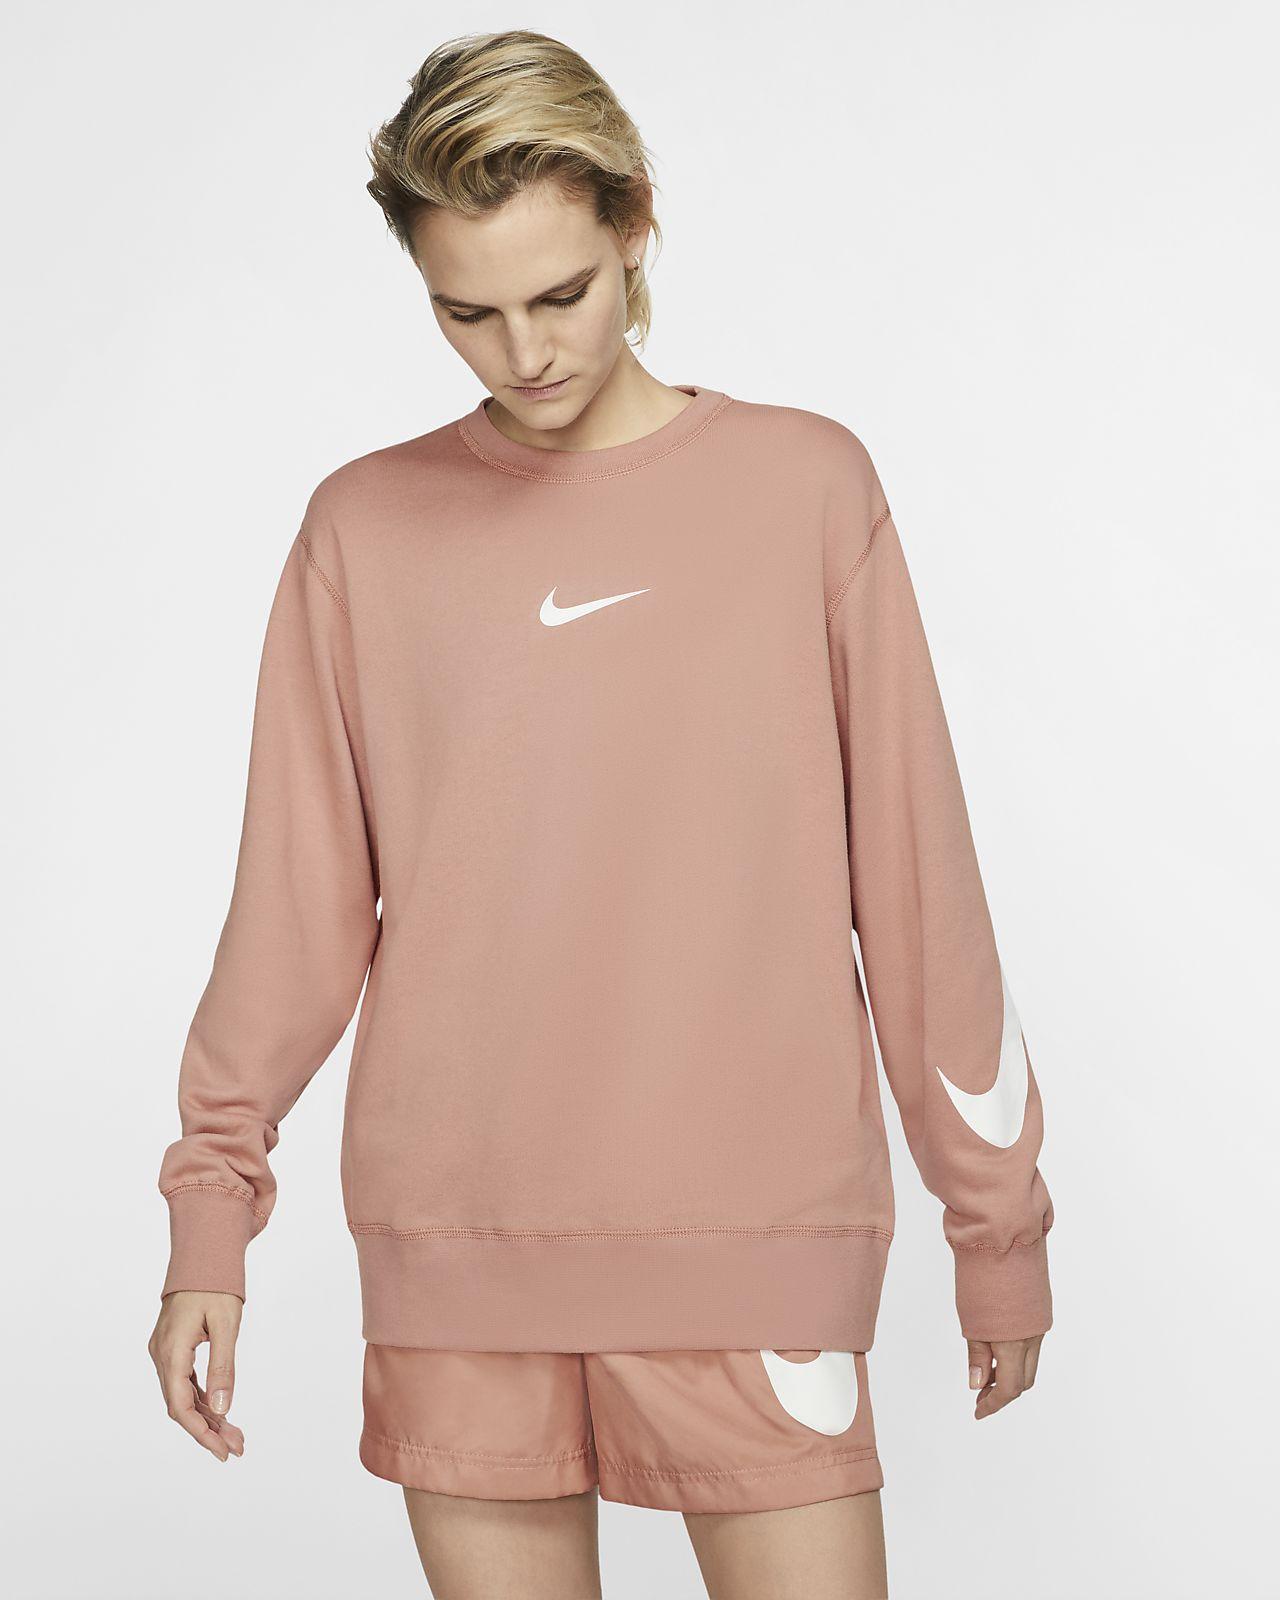 Nike Sportswear Swoosh Long-Sleeve French Terry Crew